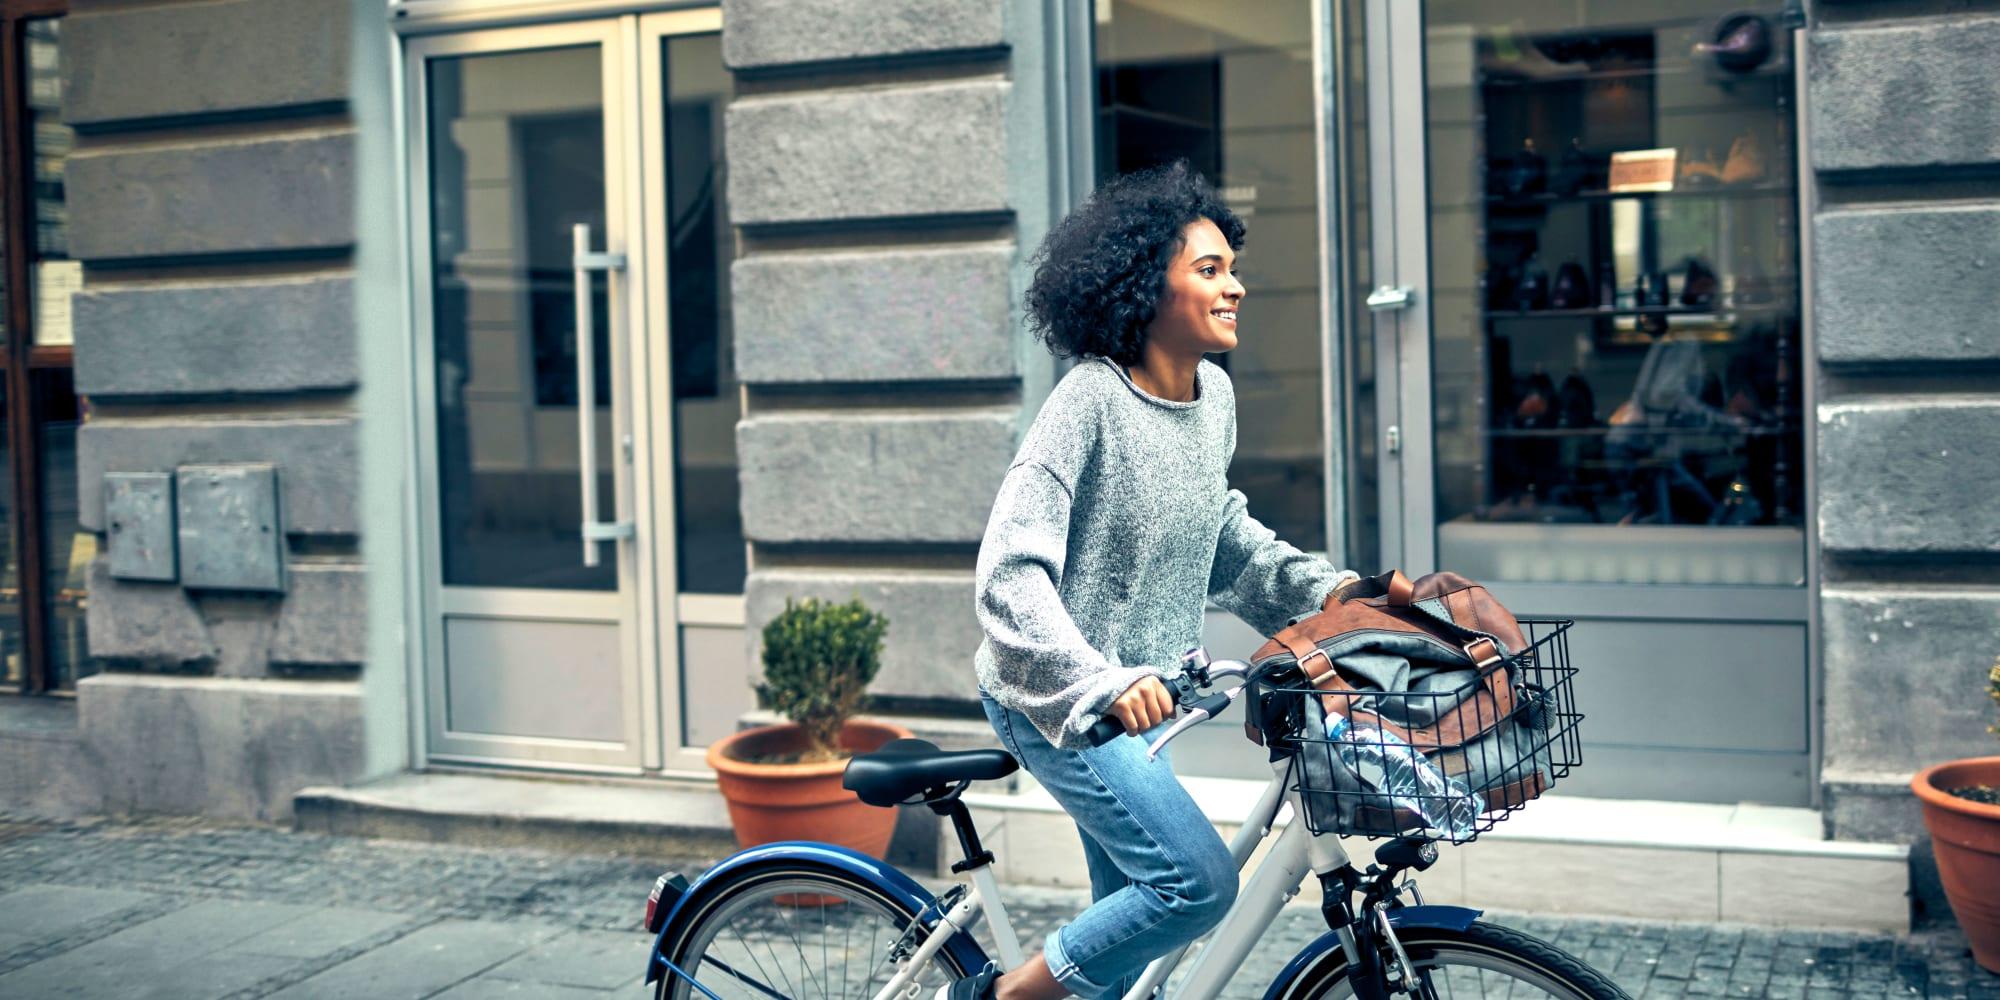 Resident enjoying a bike ride around her neighborhood near The Residences at NEWCITY in Chicago, Illinois